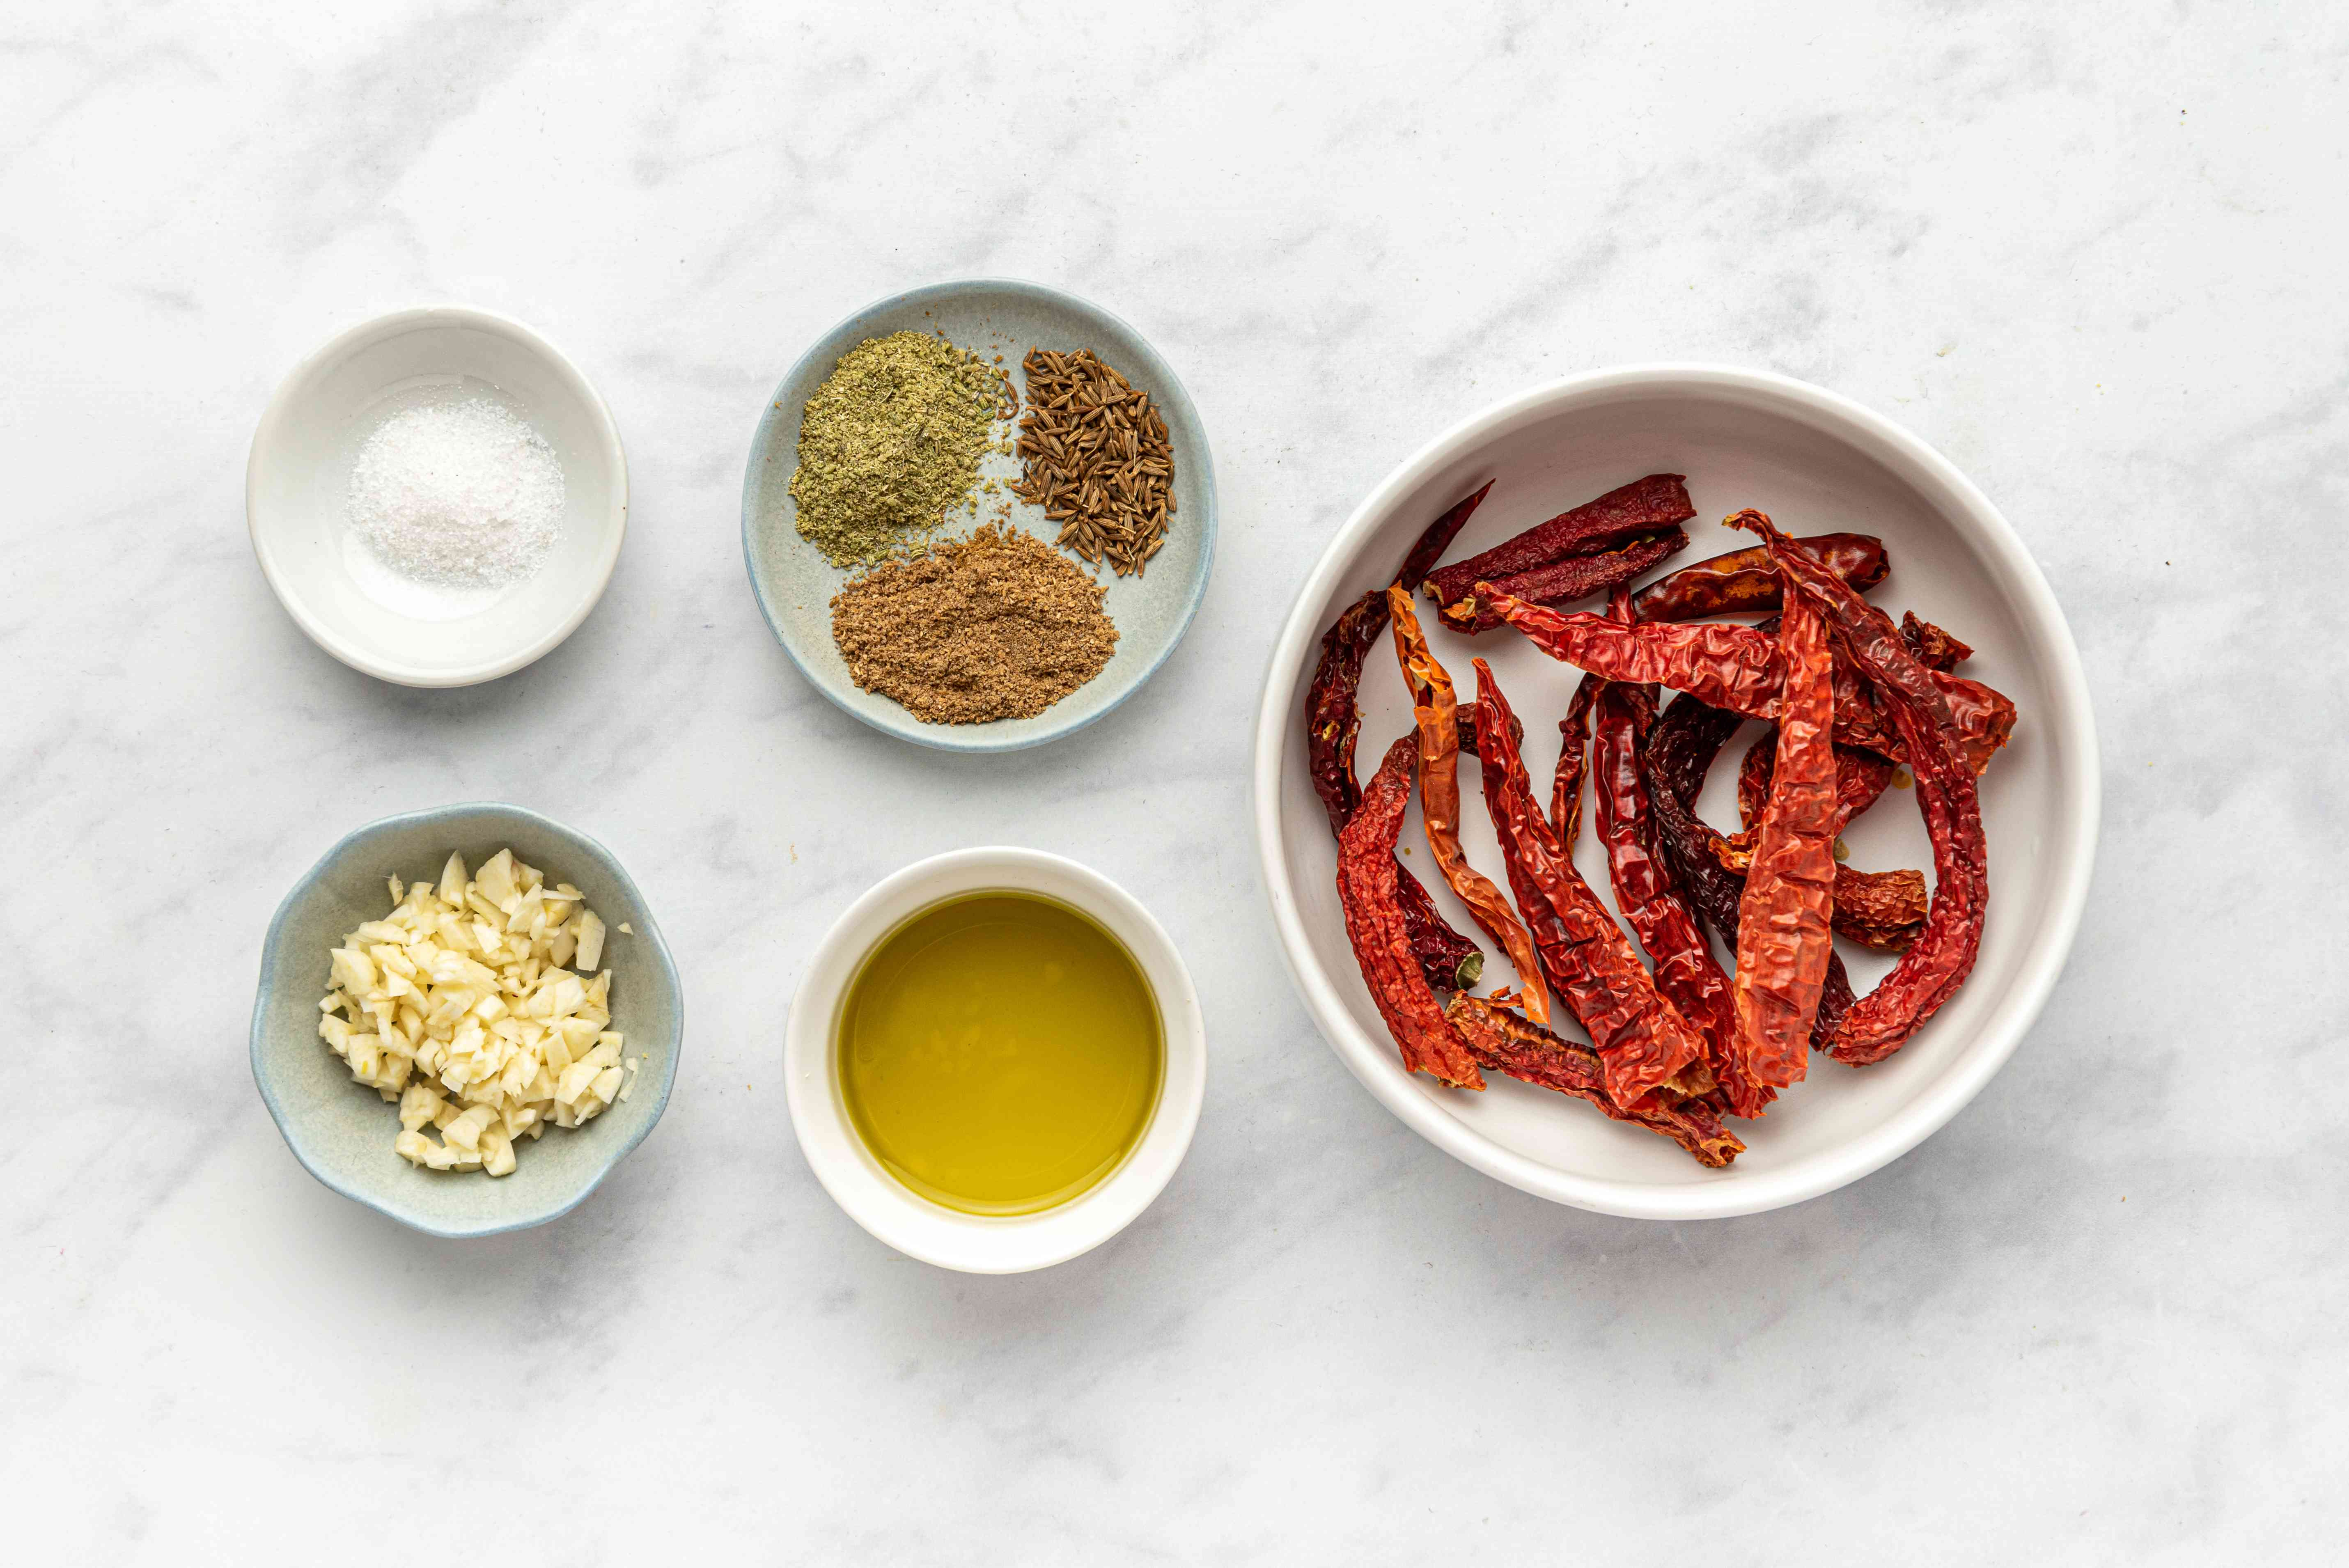 Ingredients for harissa